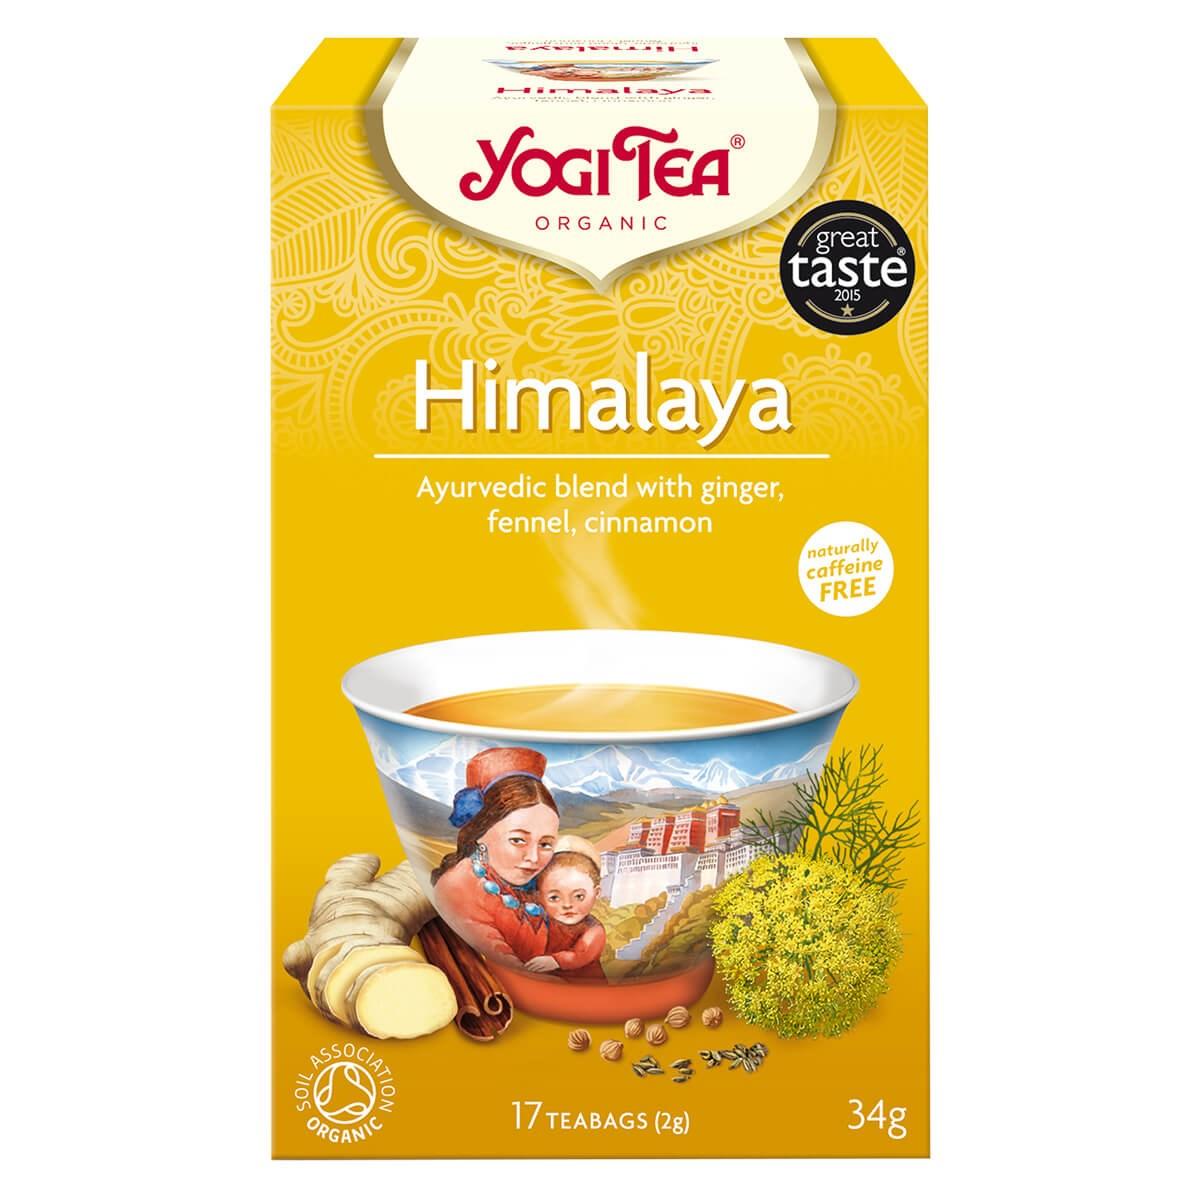 Yogi Tea Organic Himalaya Tea